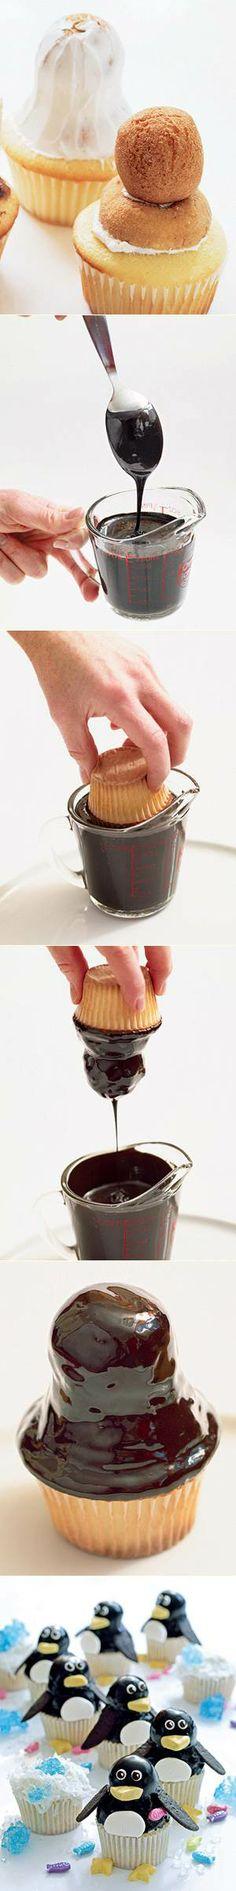 Penguin Cupcake #cupcakes #cupcakeideas #cupcakerecipes #food #yummy #sweet #delicious #cupcake